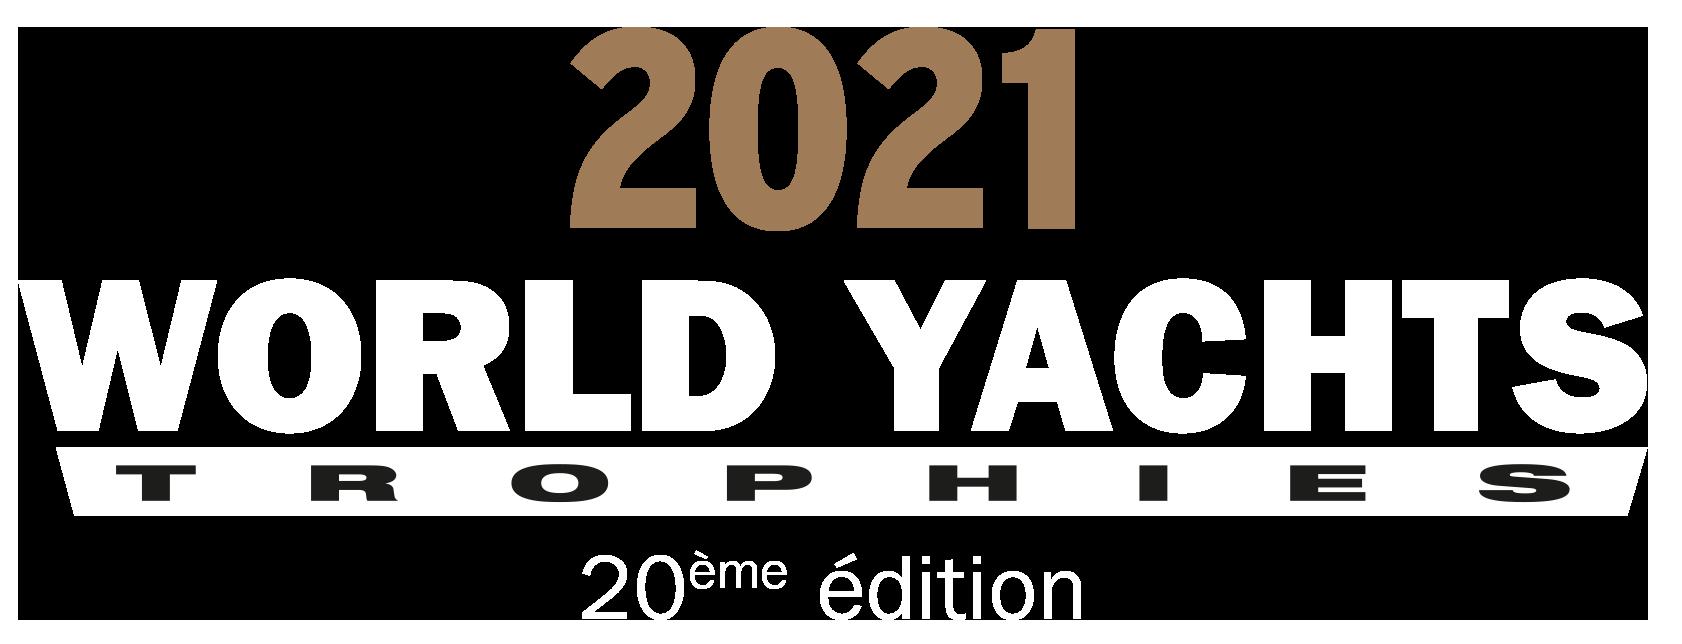 logo-world-yachts-trophies-2021-20e-edition-blanc